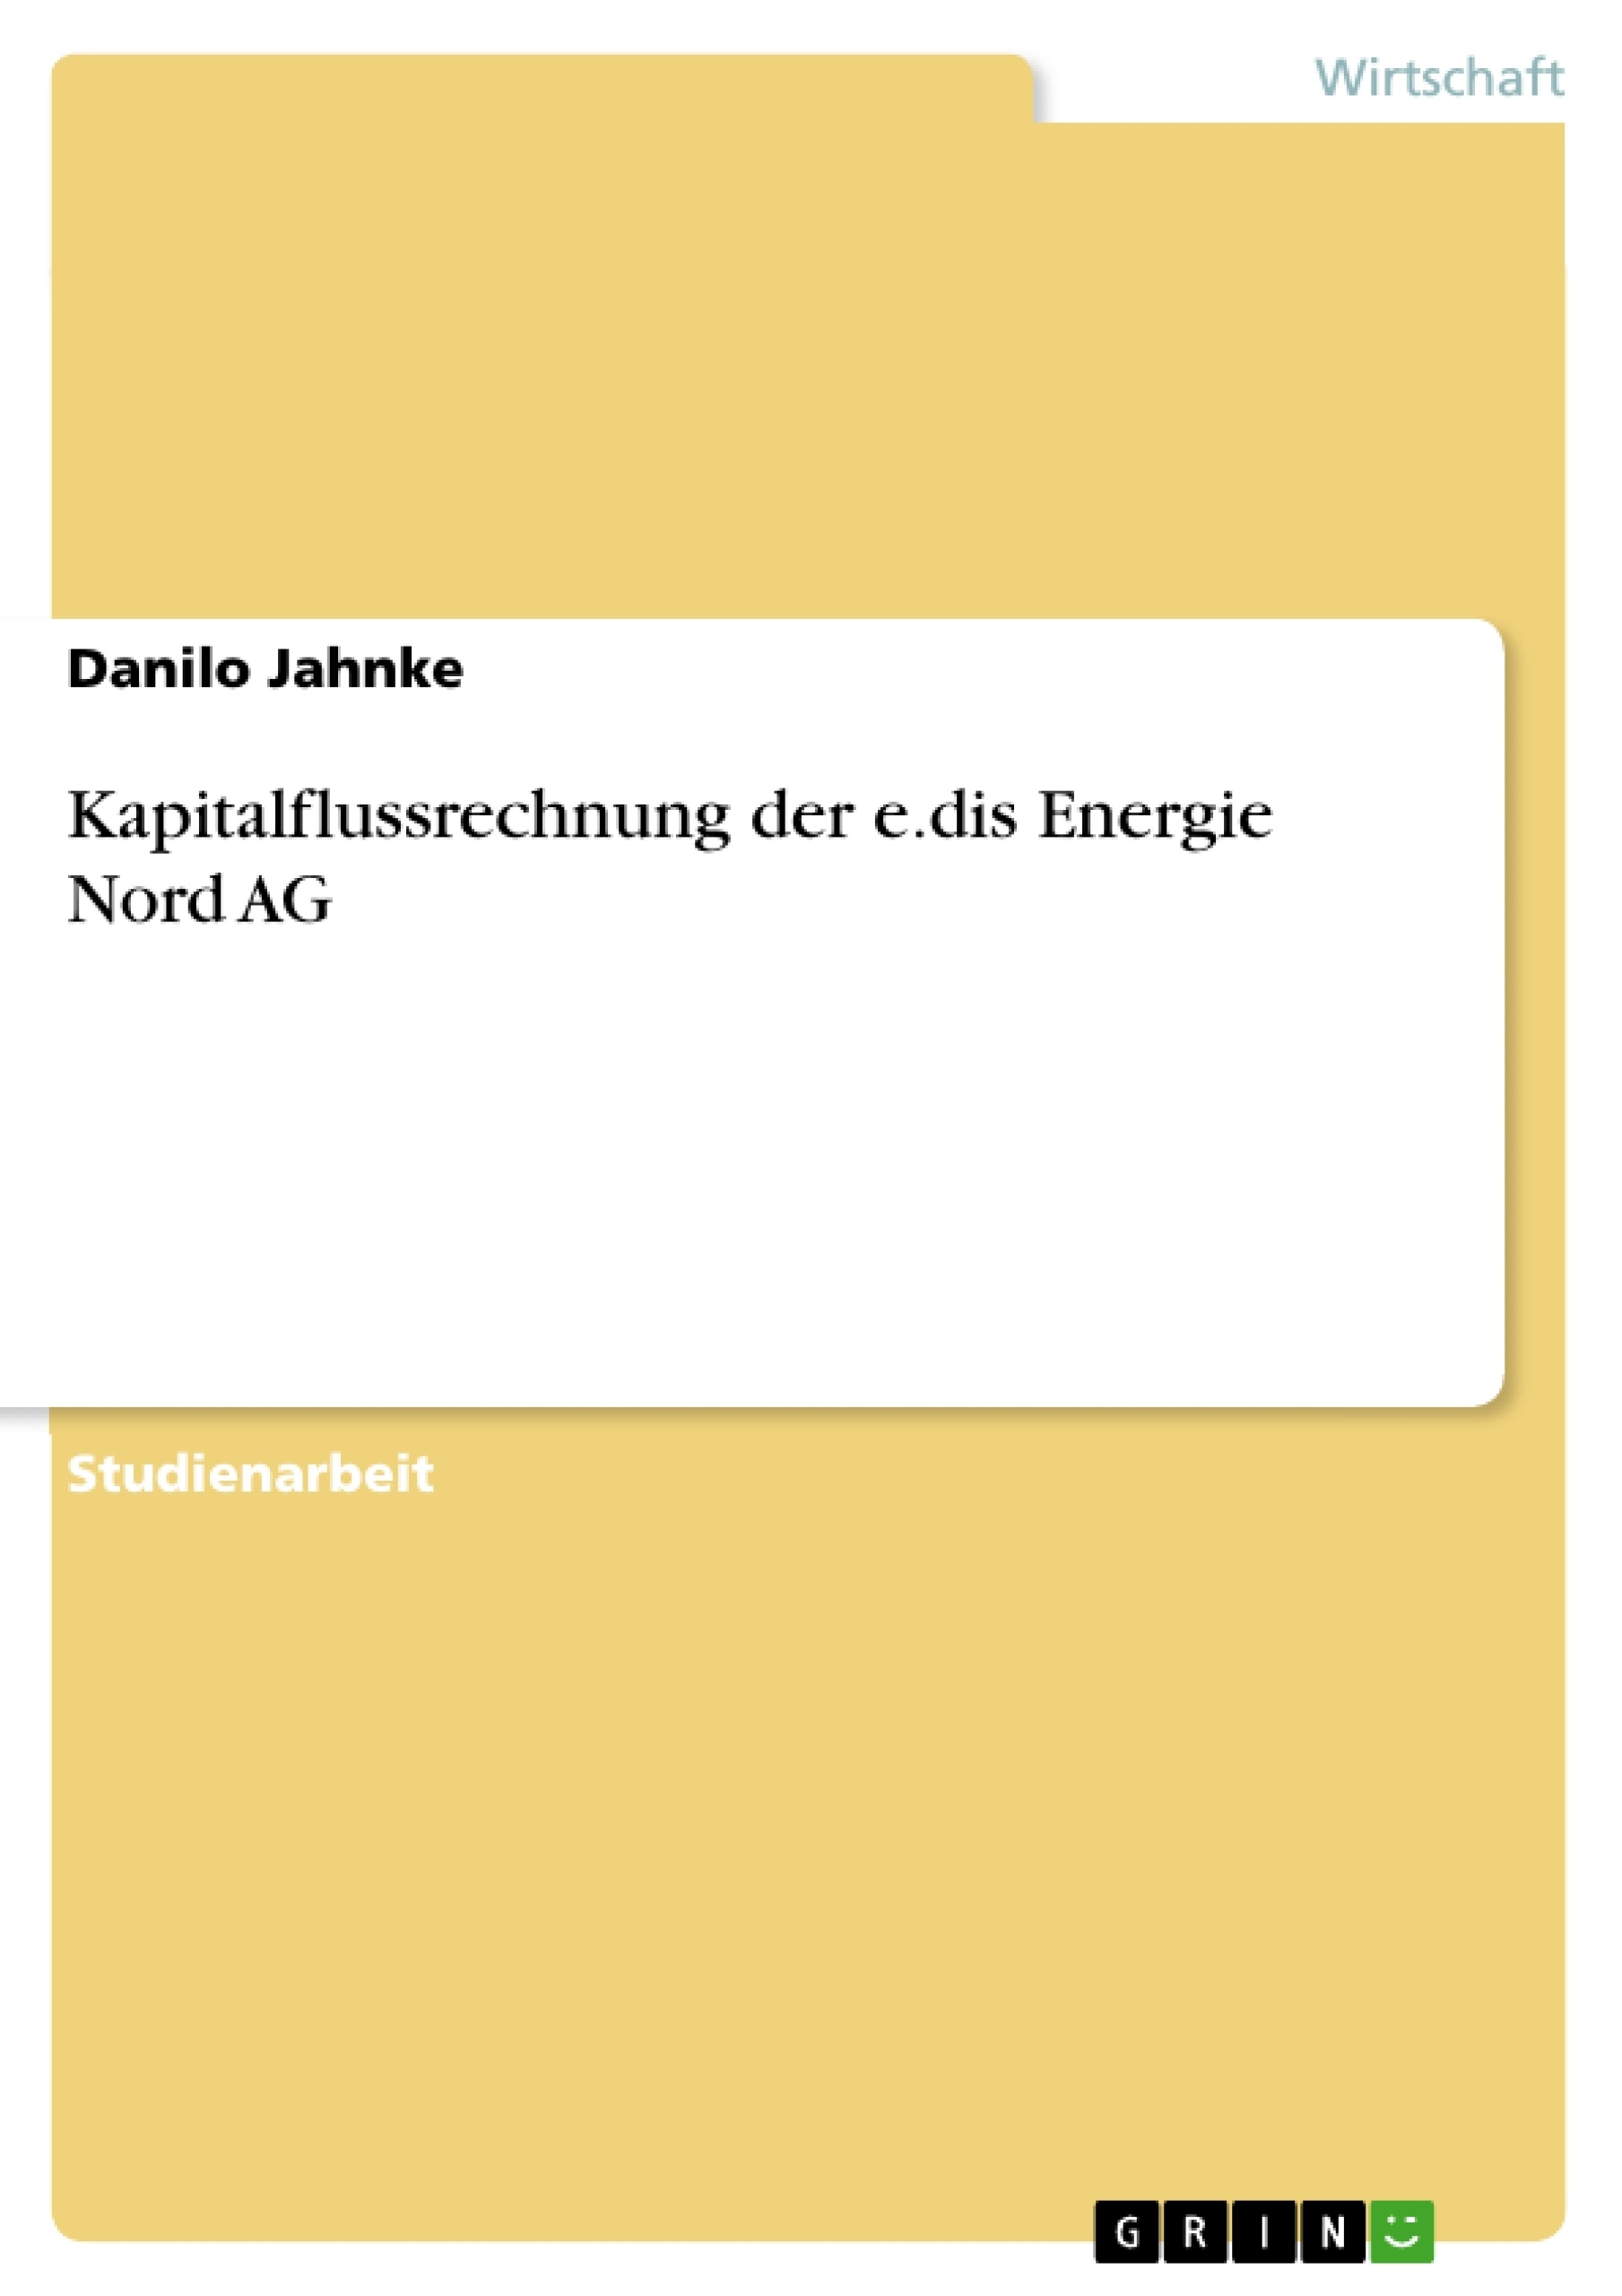 Titel: Kapitalflussrechnung der e.dis Energie Nord AG